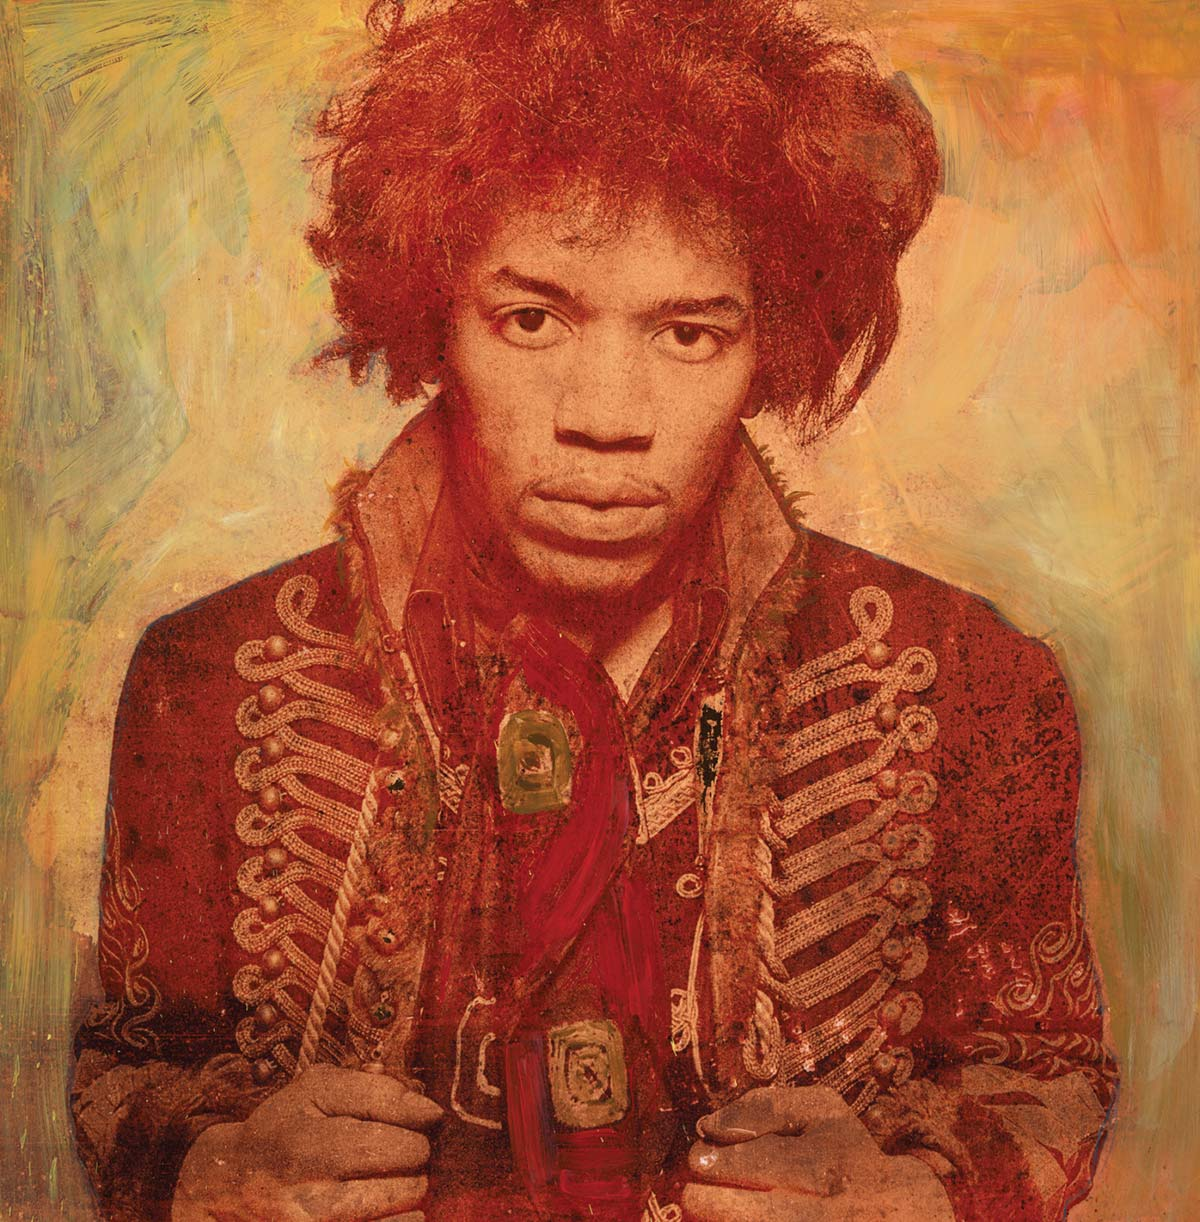 Sun Gold ChromaLuxe featuring Jimi Hendrix